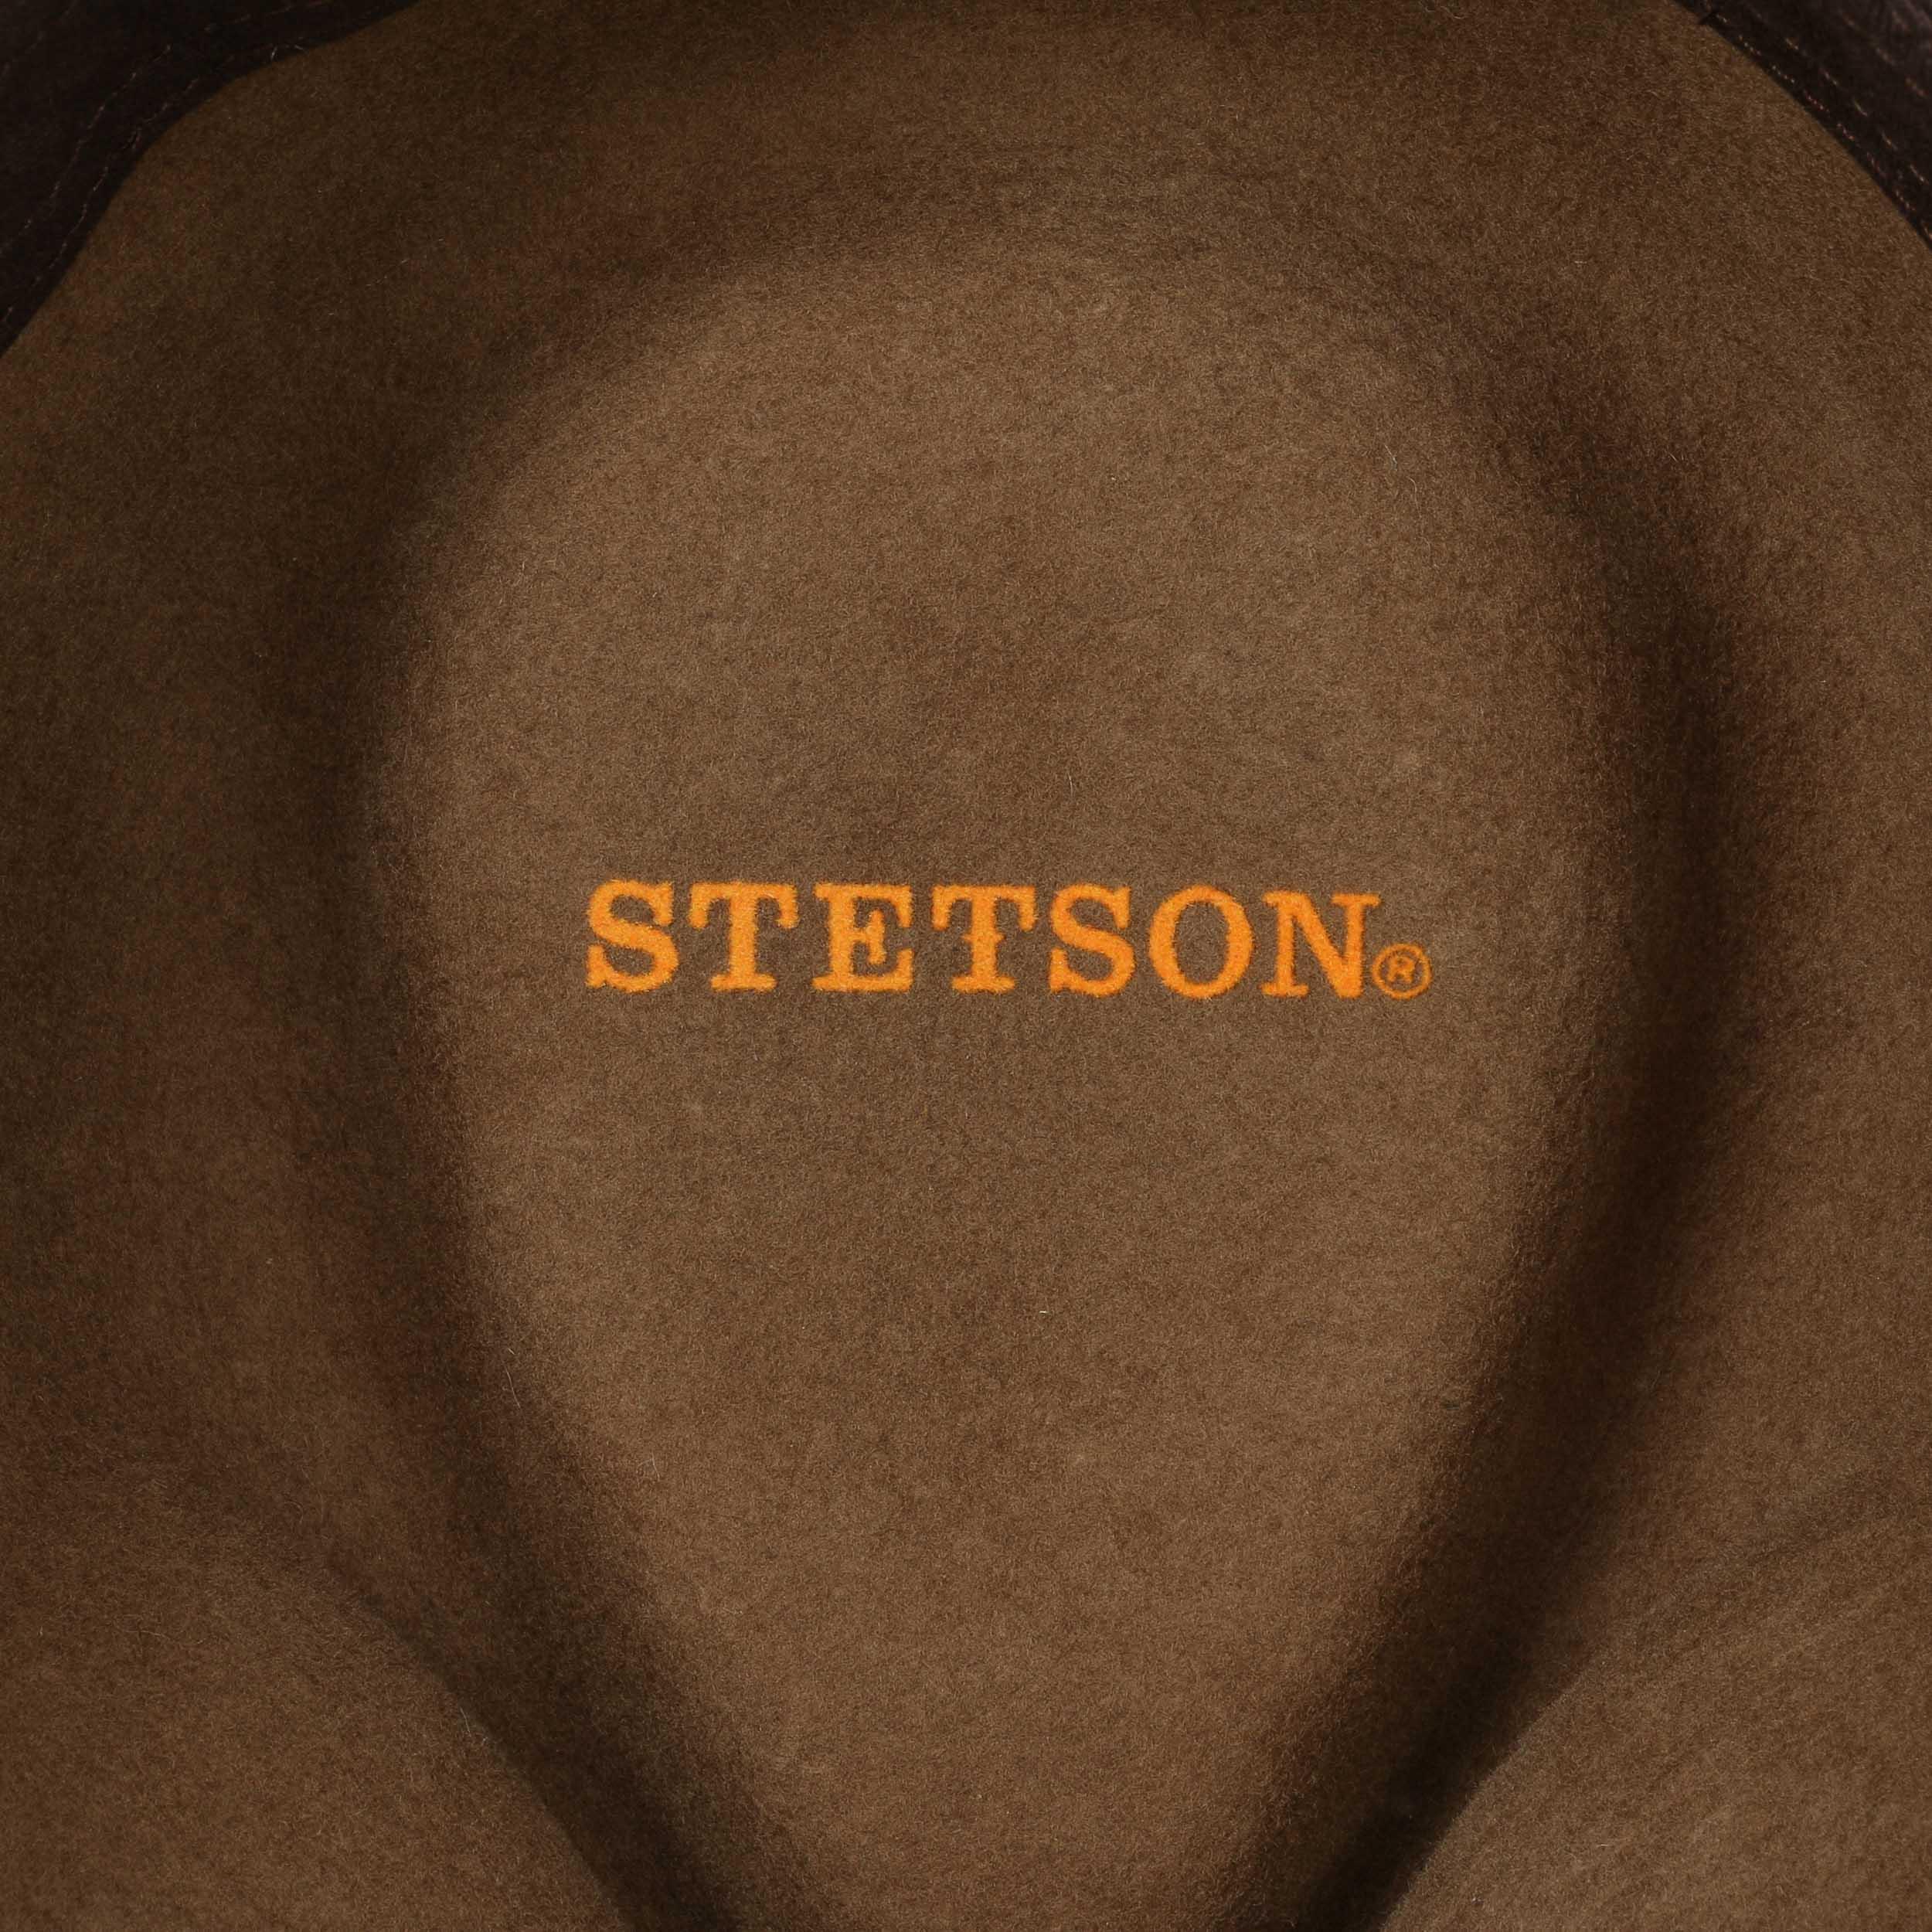 ... Powland Cowboy Cappello by Stetson - marrone 4 ... 53dbfce04375